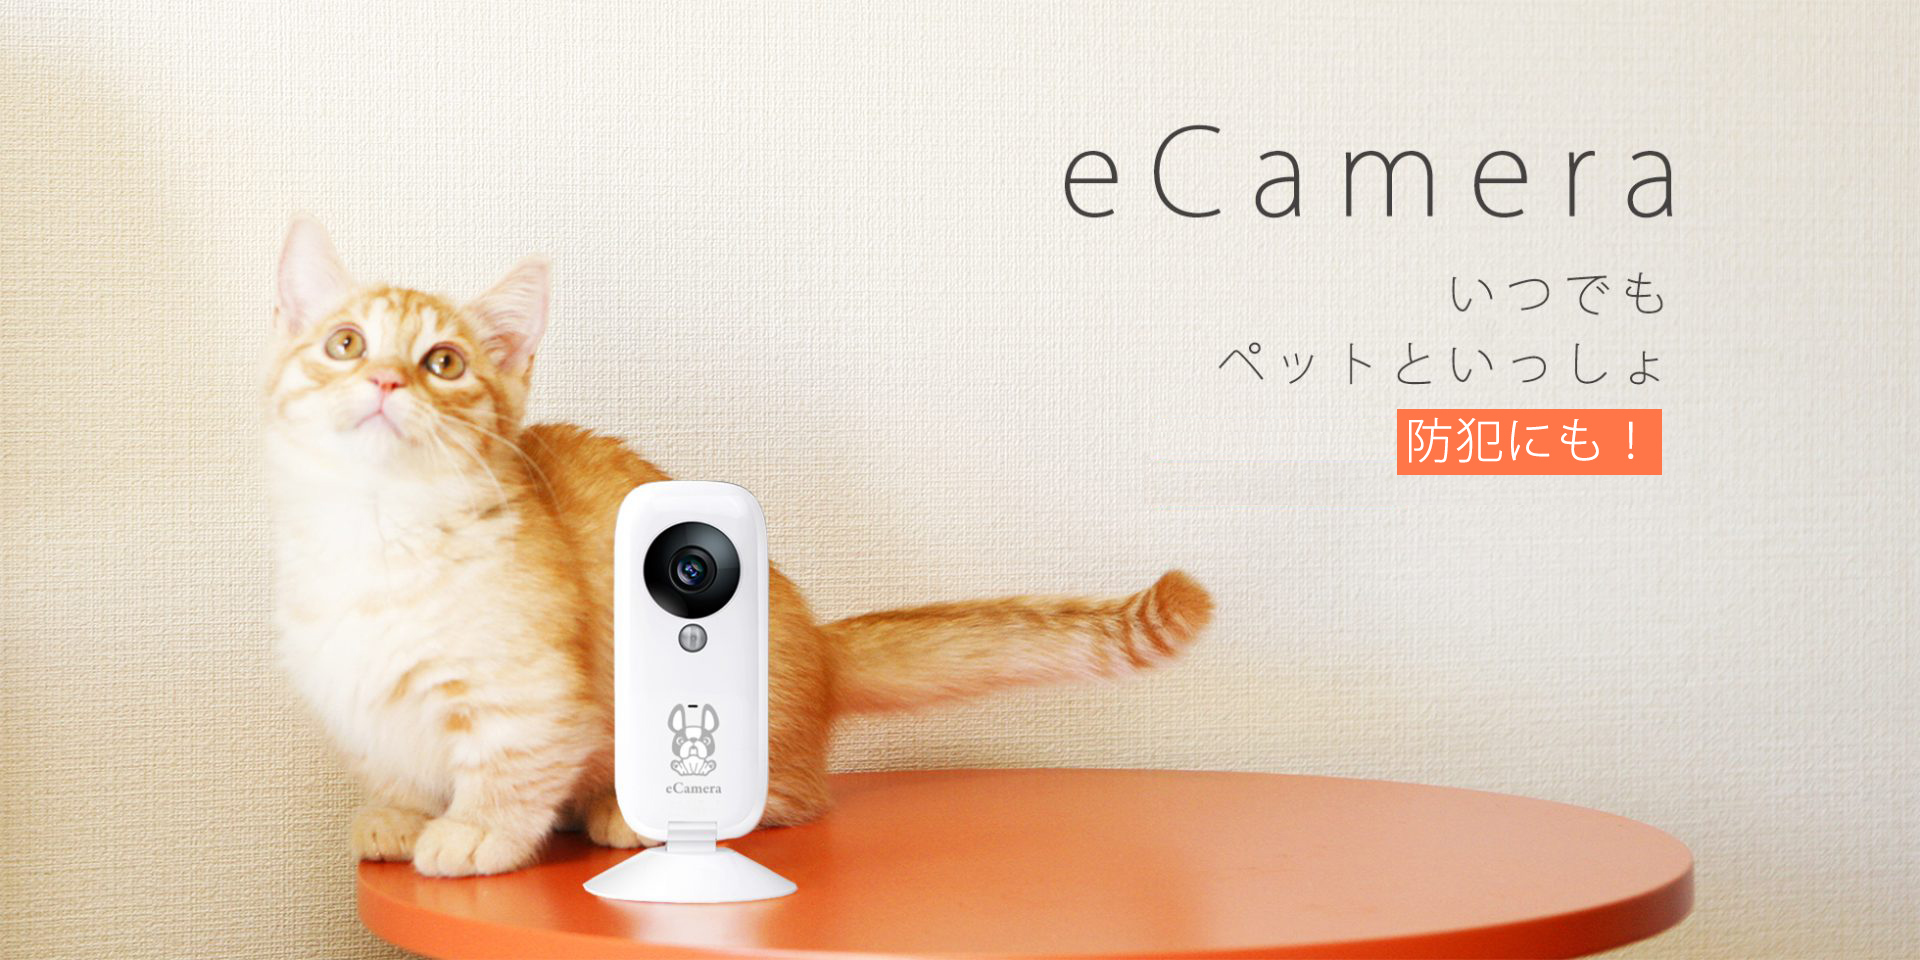 eCamera|IoT 家電 スマートホーム・スマートハウス|Link Japanメイン画像